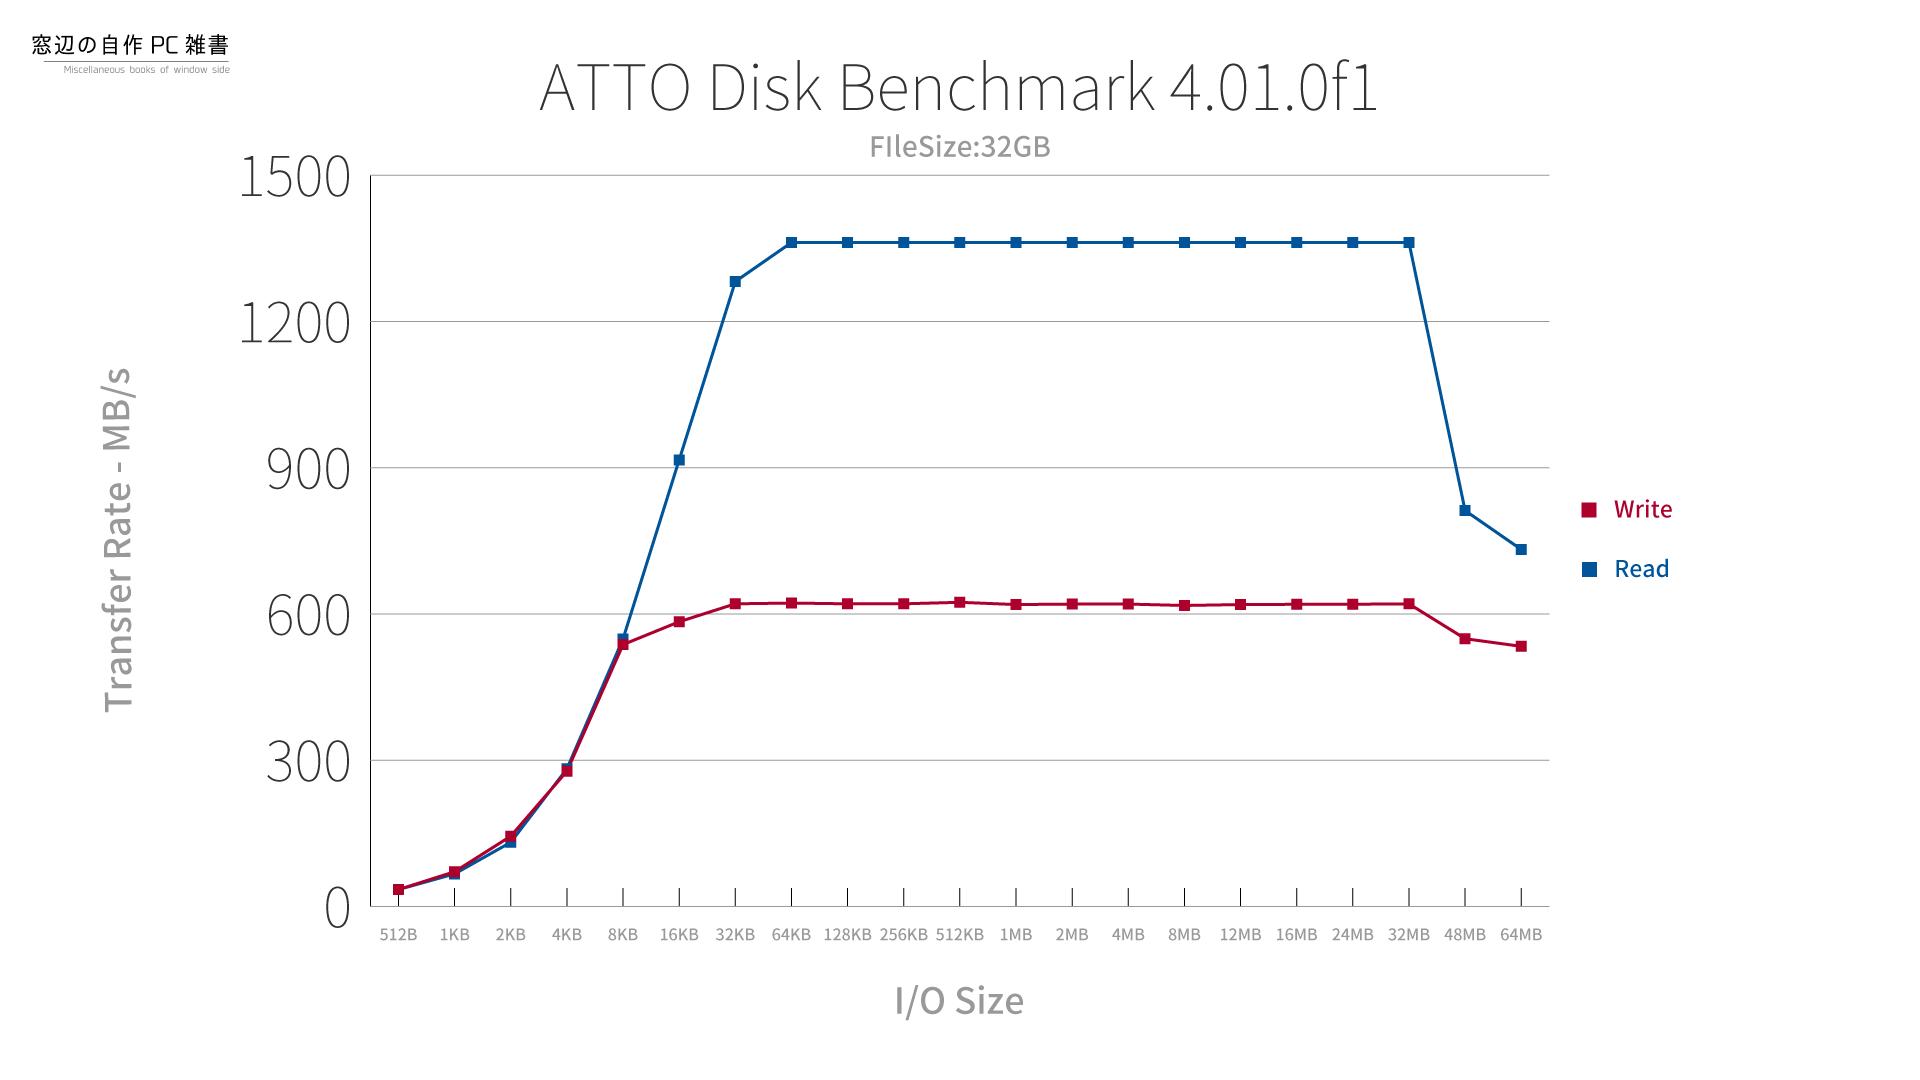 intel Optane 800pのATTO Disk Benchmarkの結果(FileSize:32GB)